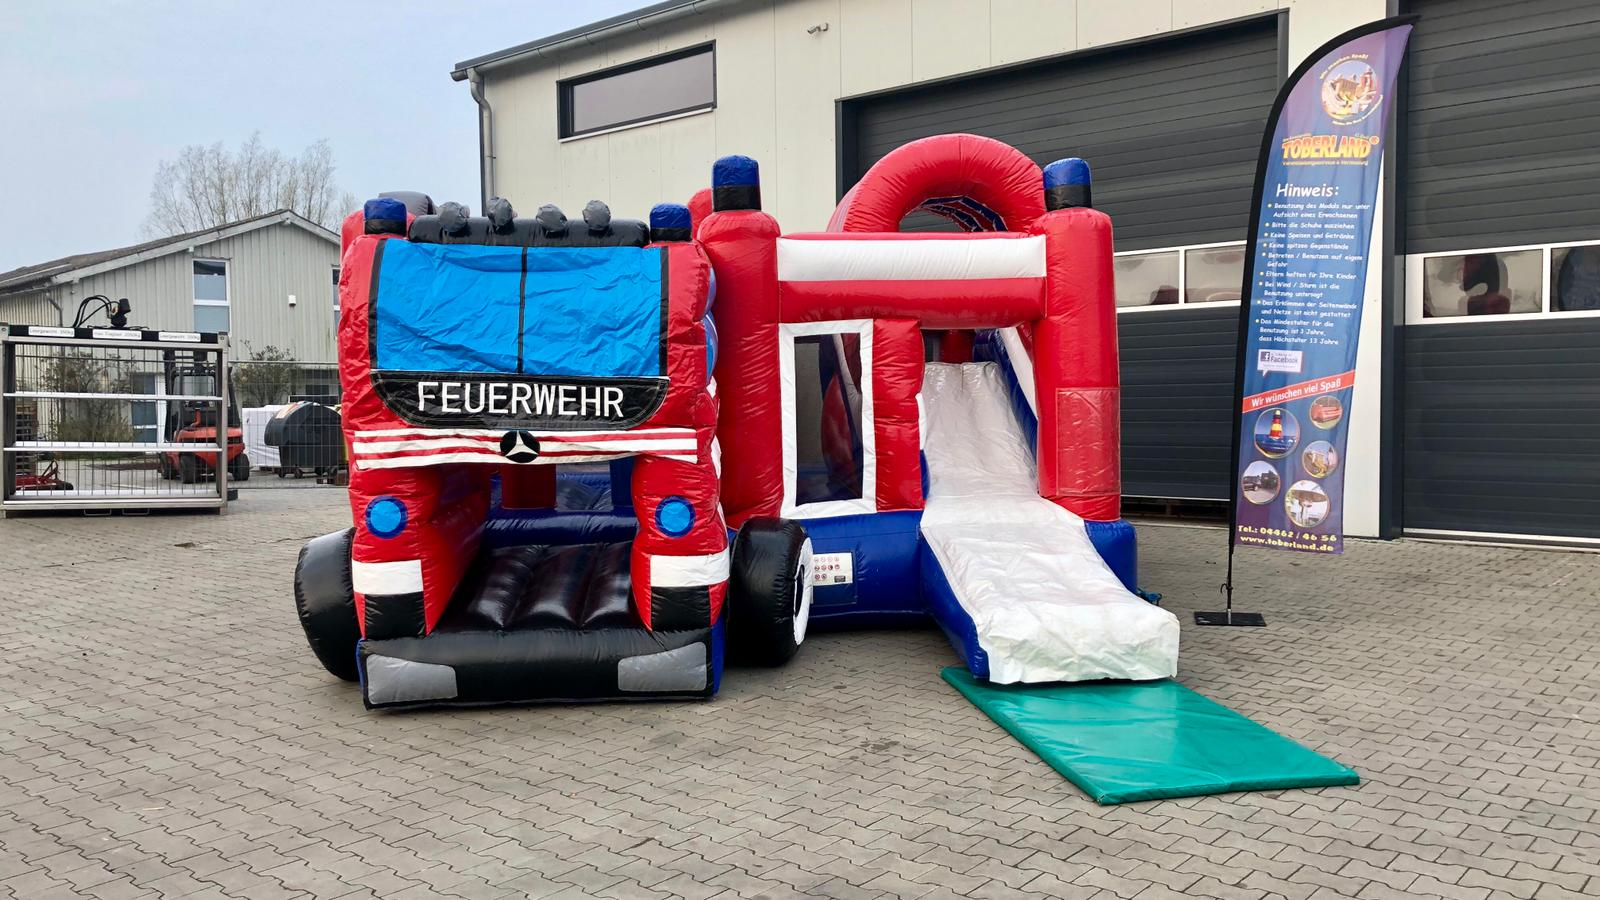 Hüpfburg-Deluxe-Feuerwehr-1